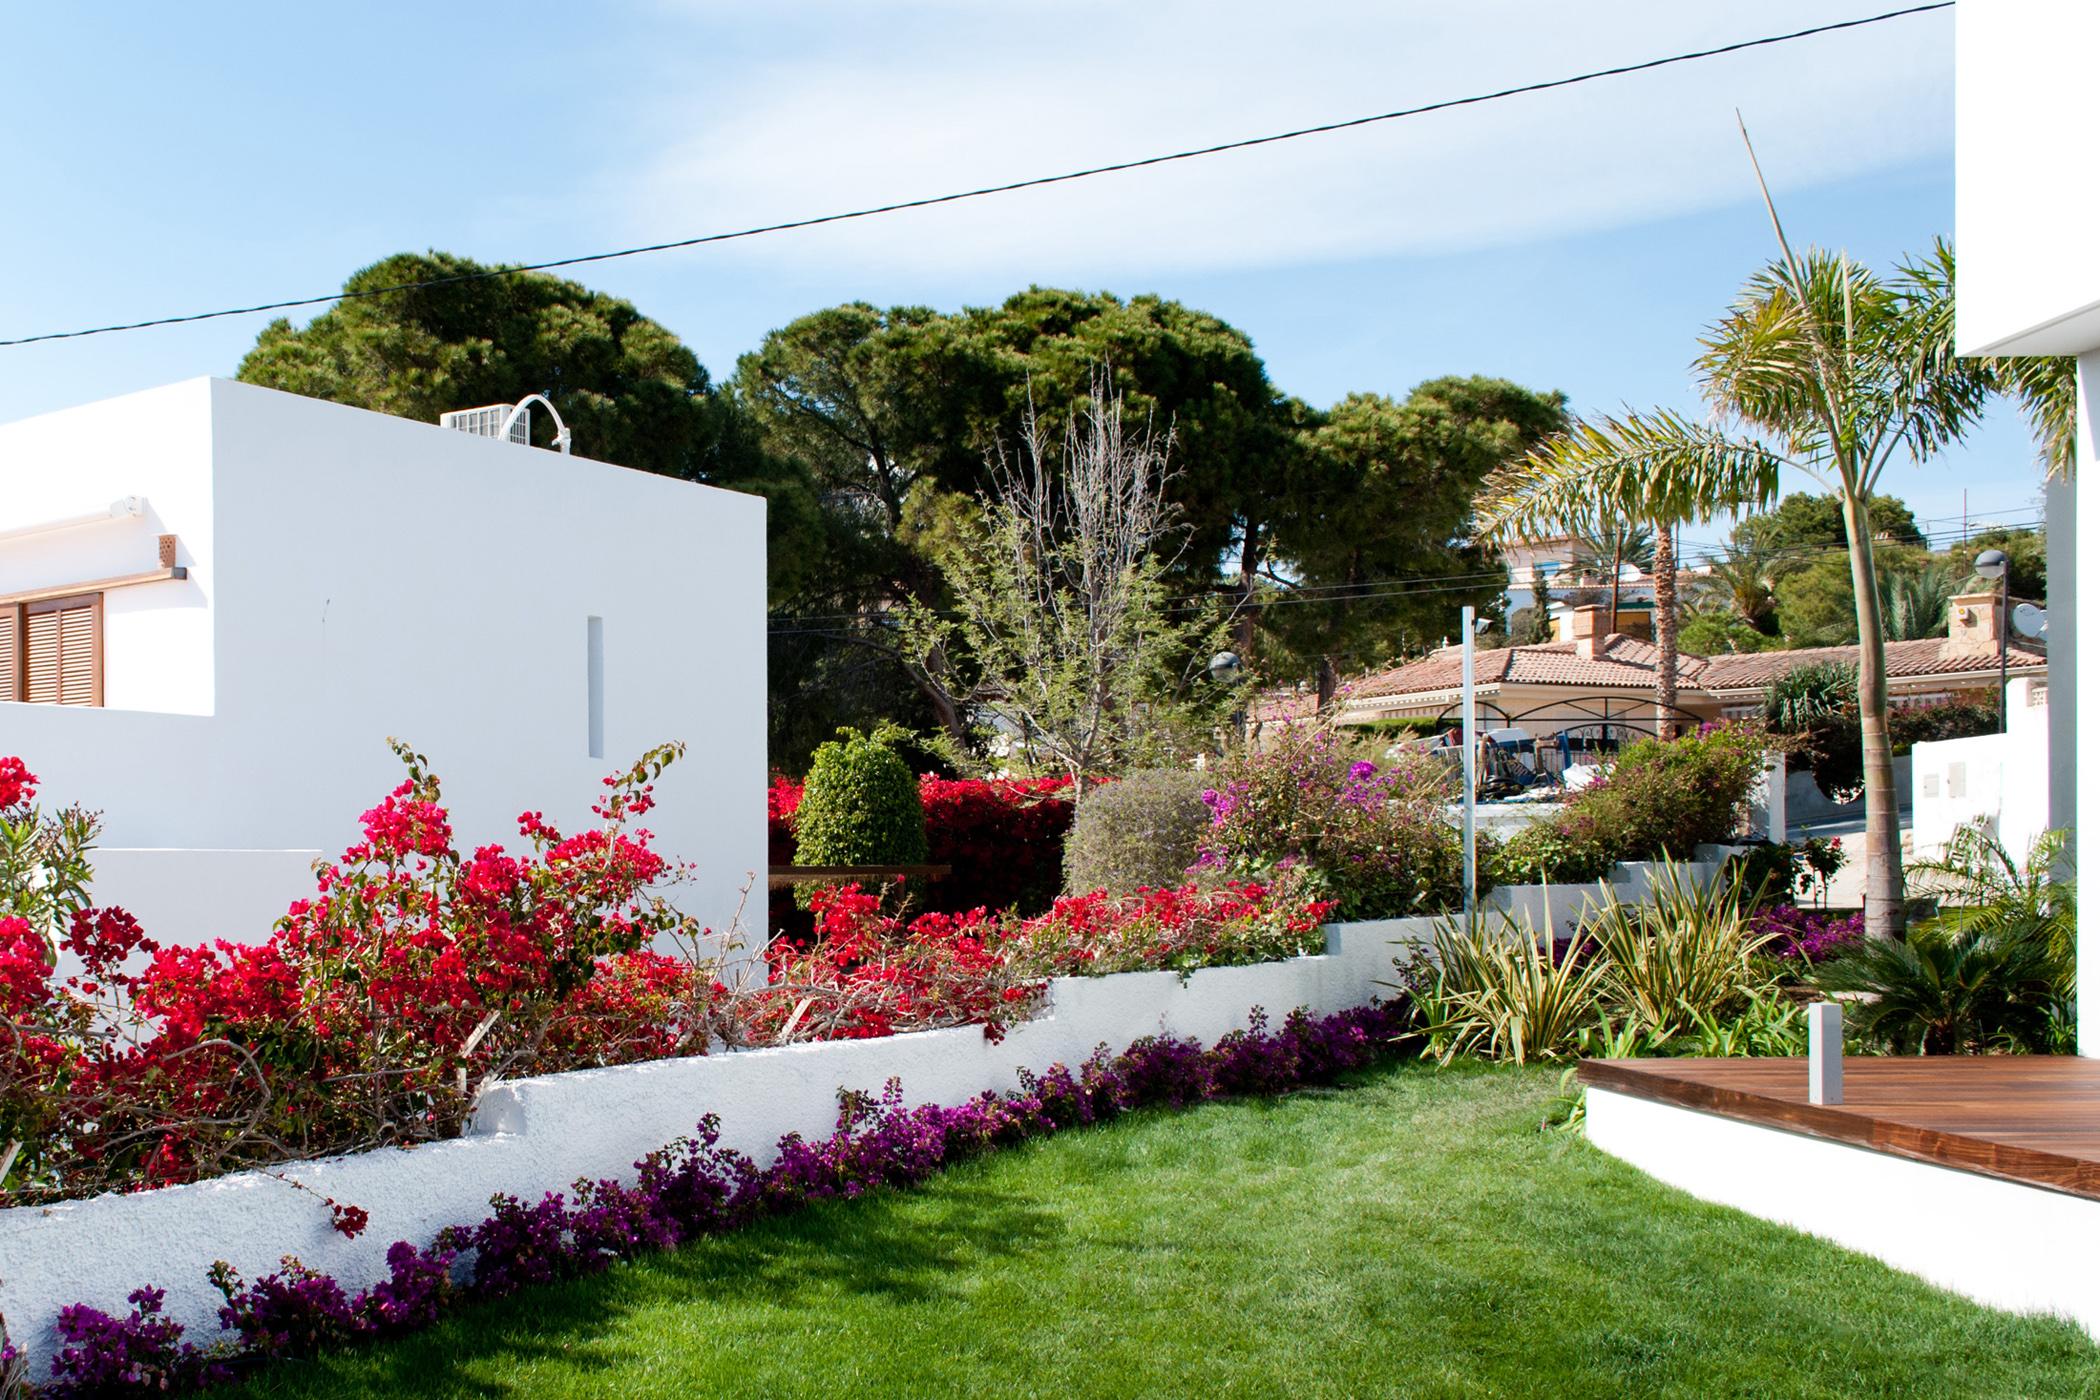 Jardin de David Jimenez en Alicante